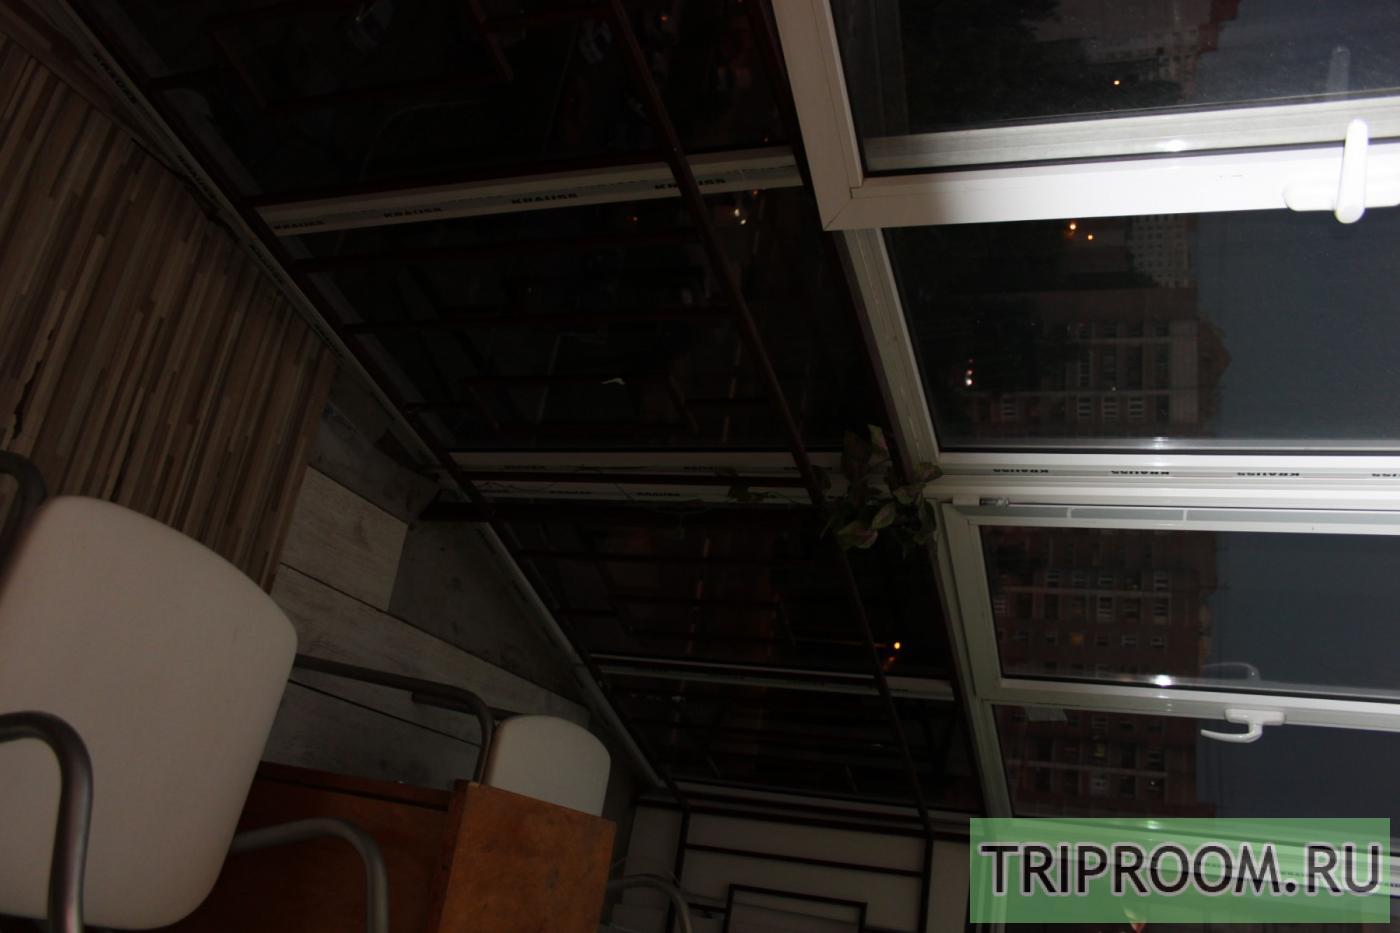 1-комнатная квартира посуточно (вариант № 6675), ул. Победы бульвар, фото № 10